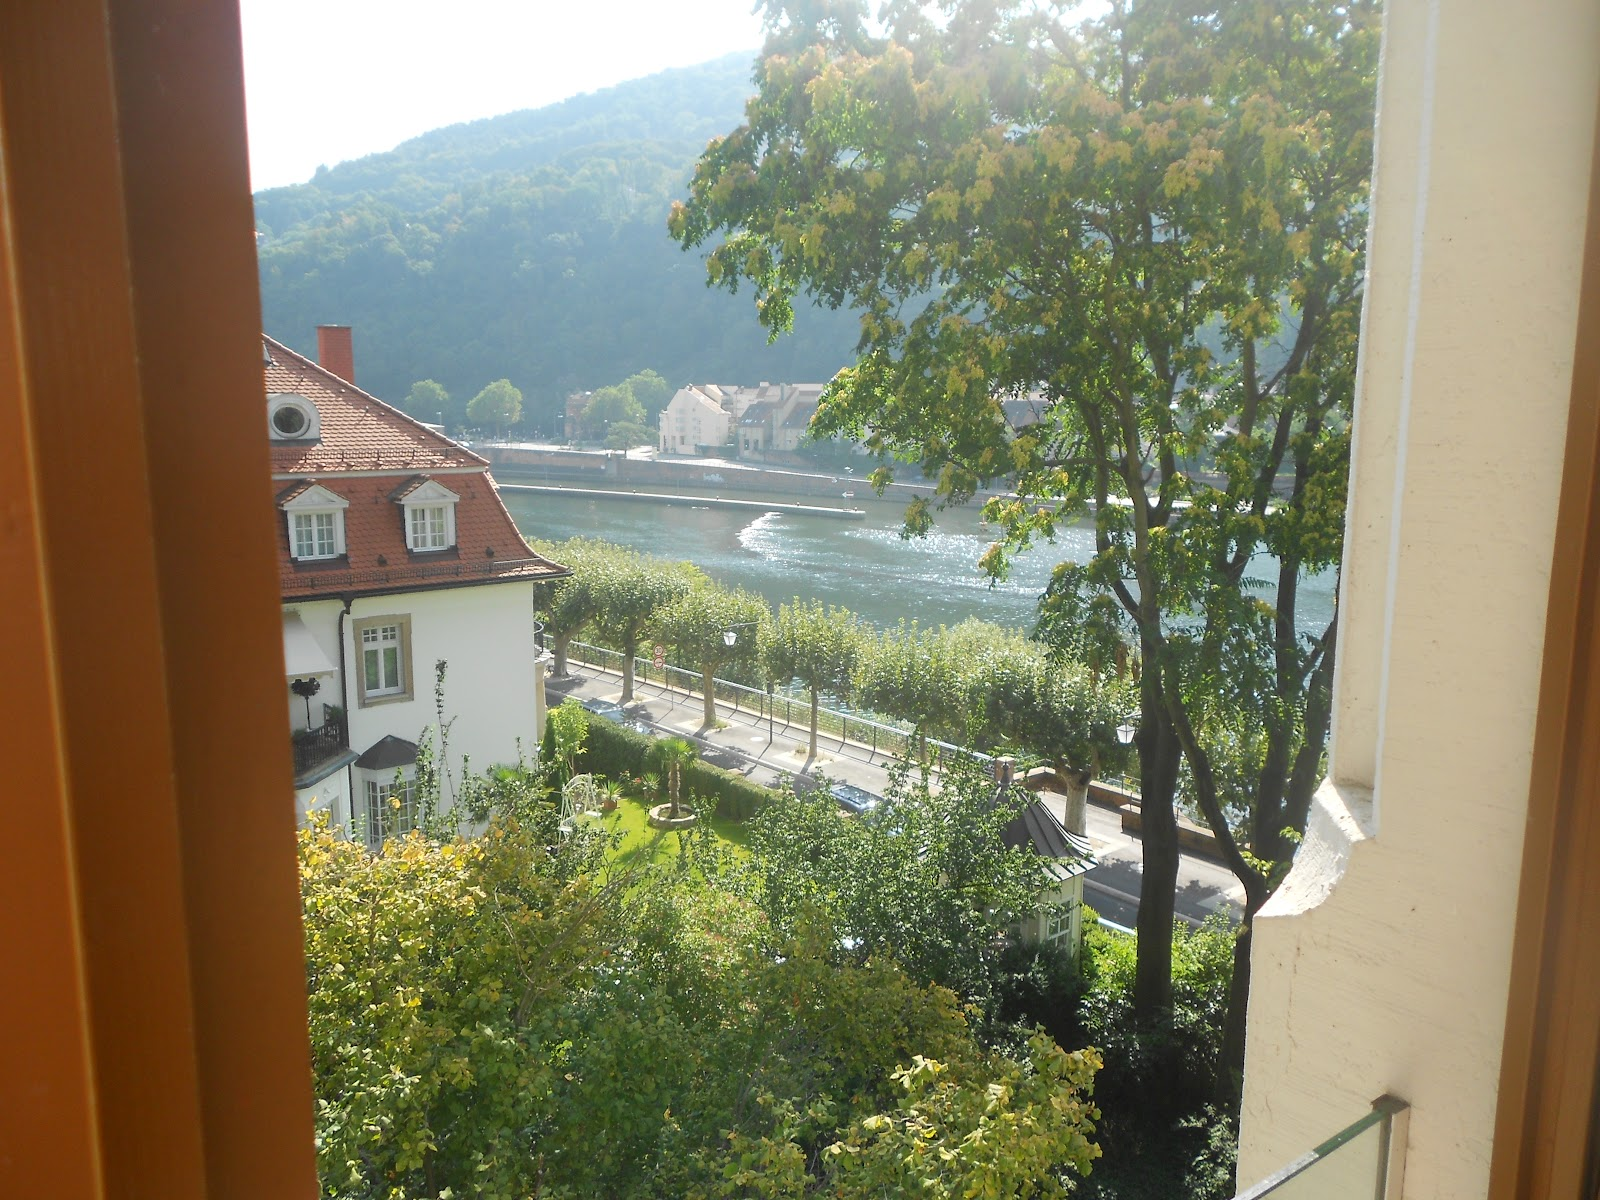 german language course wel e to heidelberg